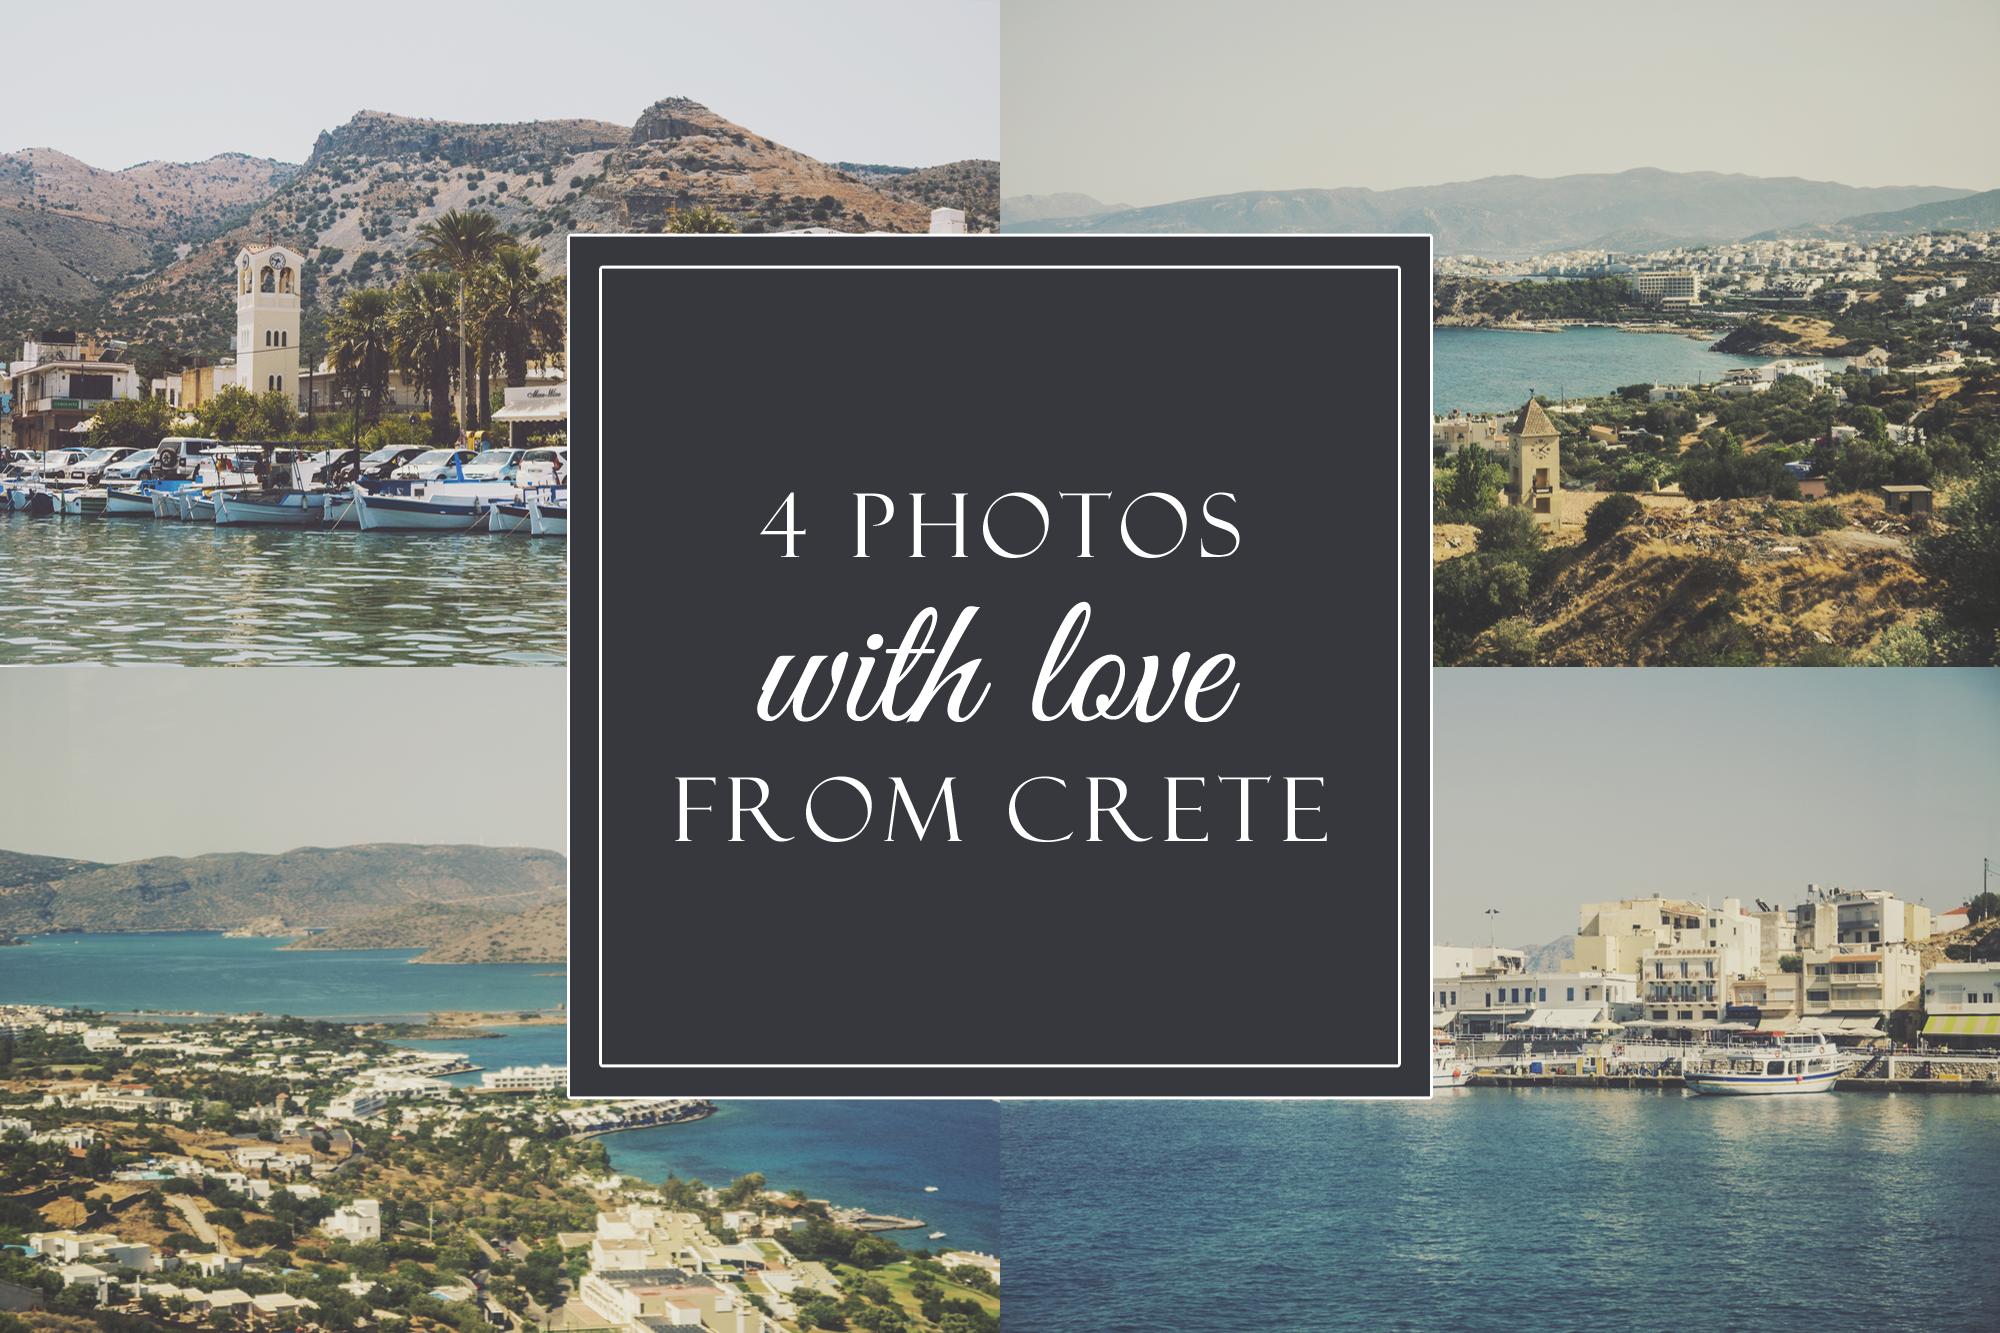 4 photos from Crete example image 1